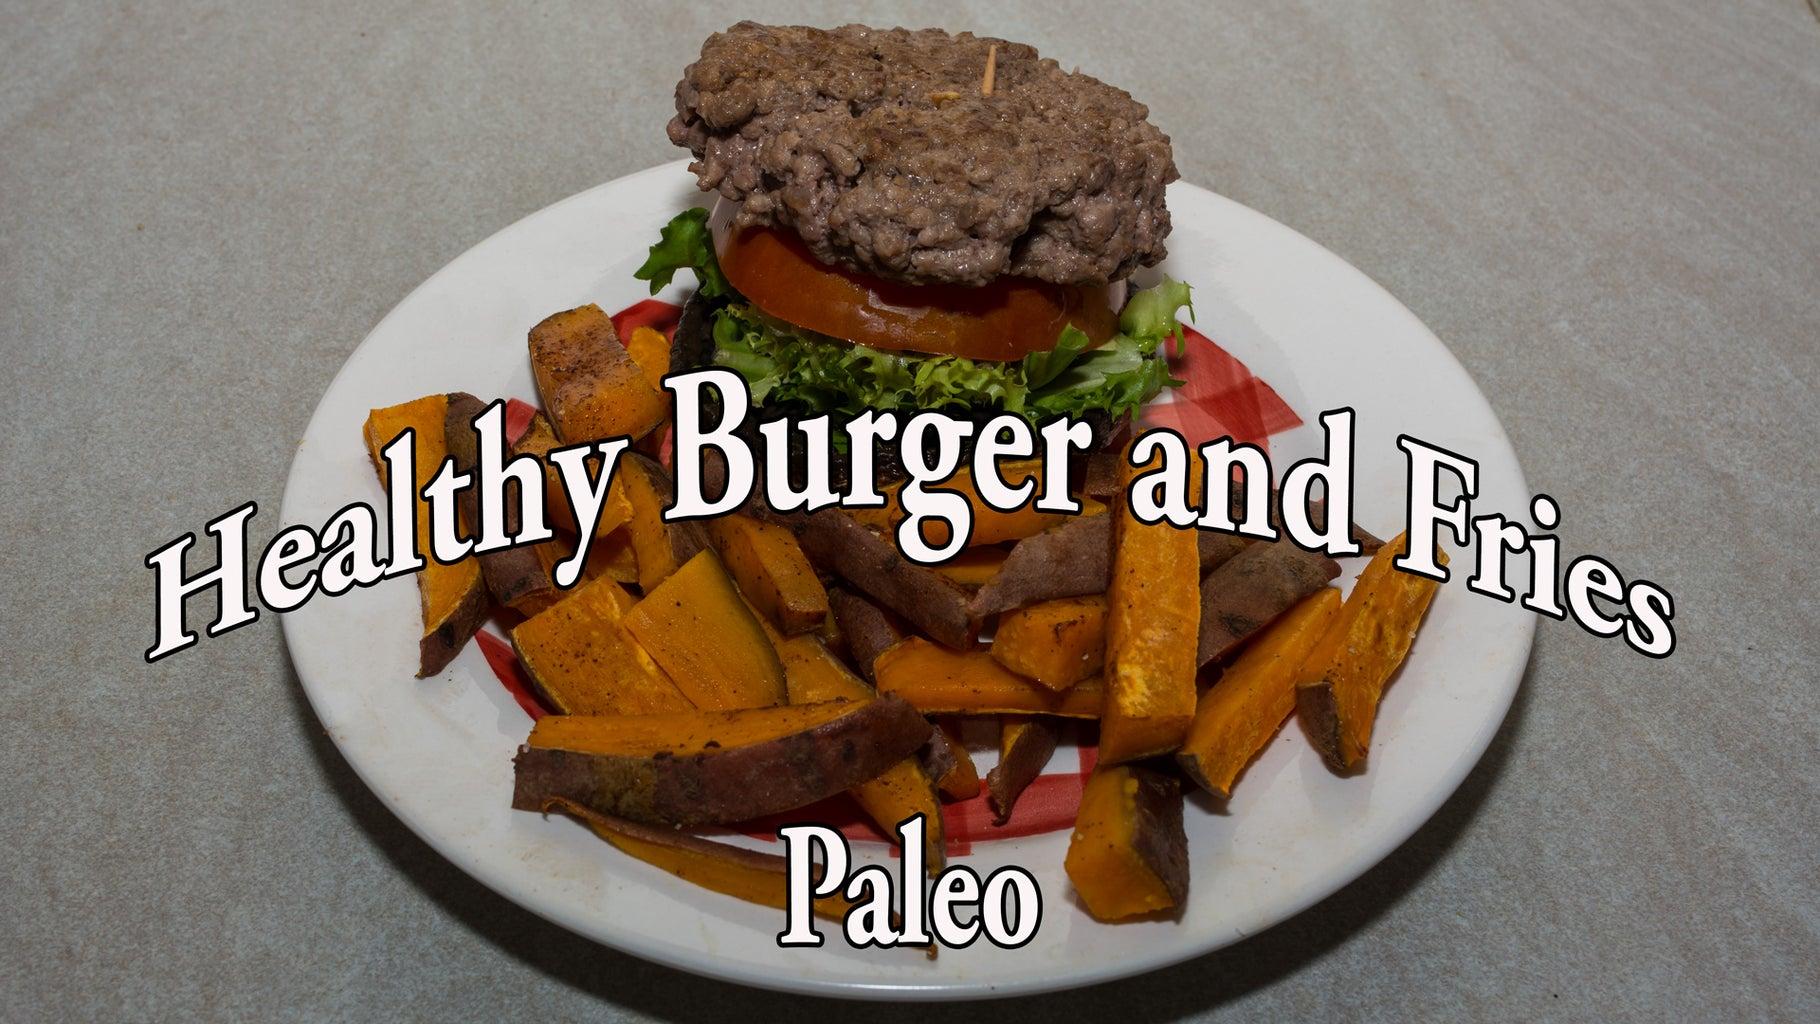 Paleo Burgers and Fries